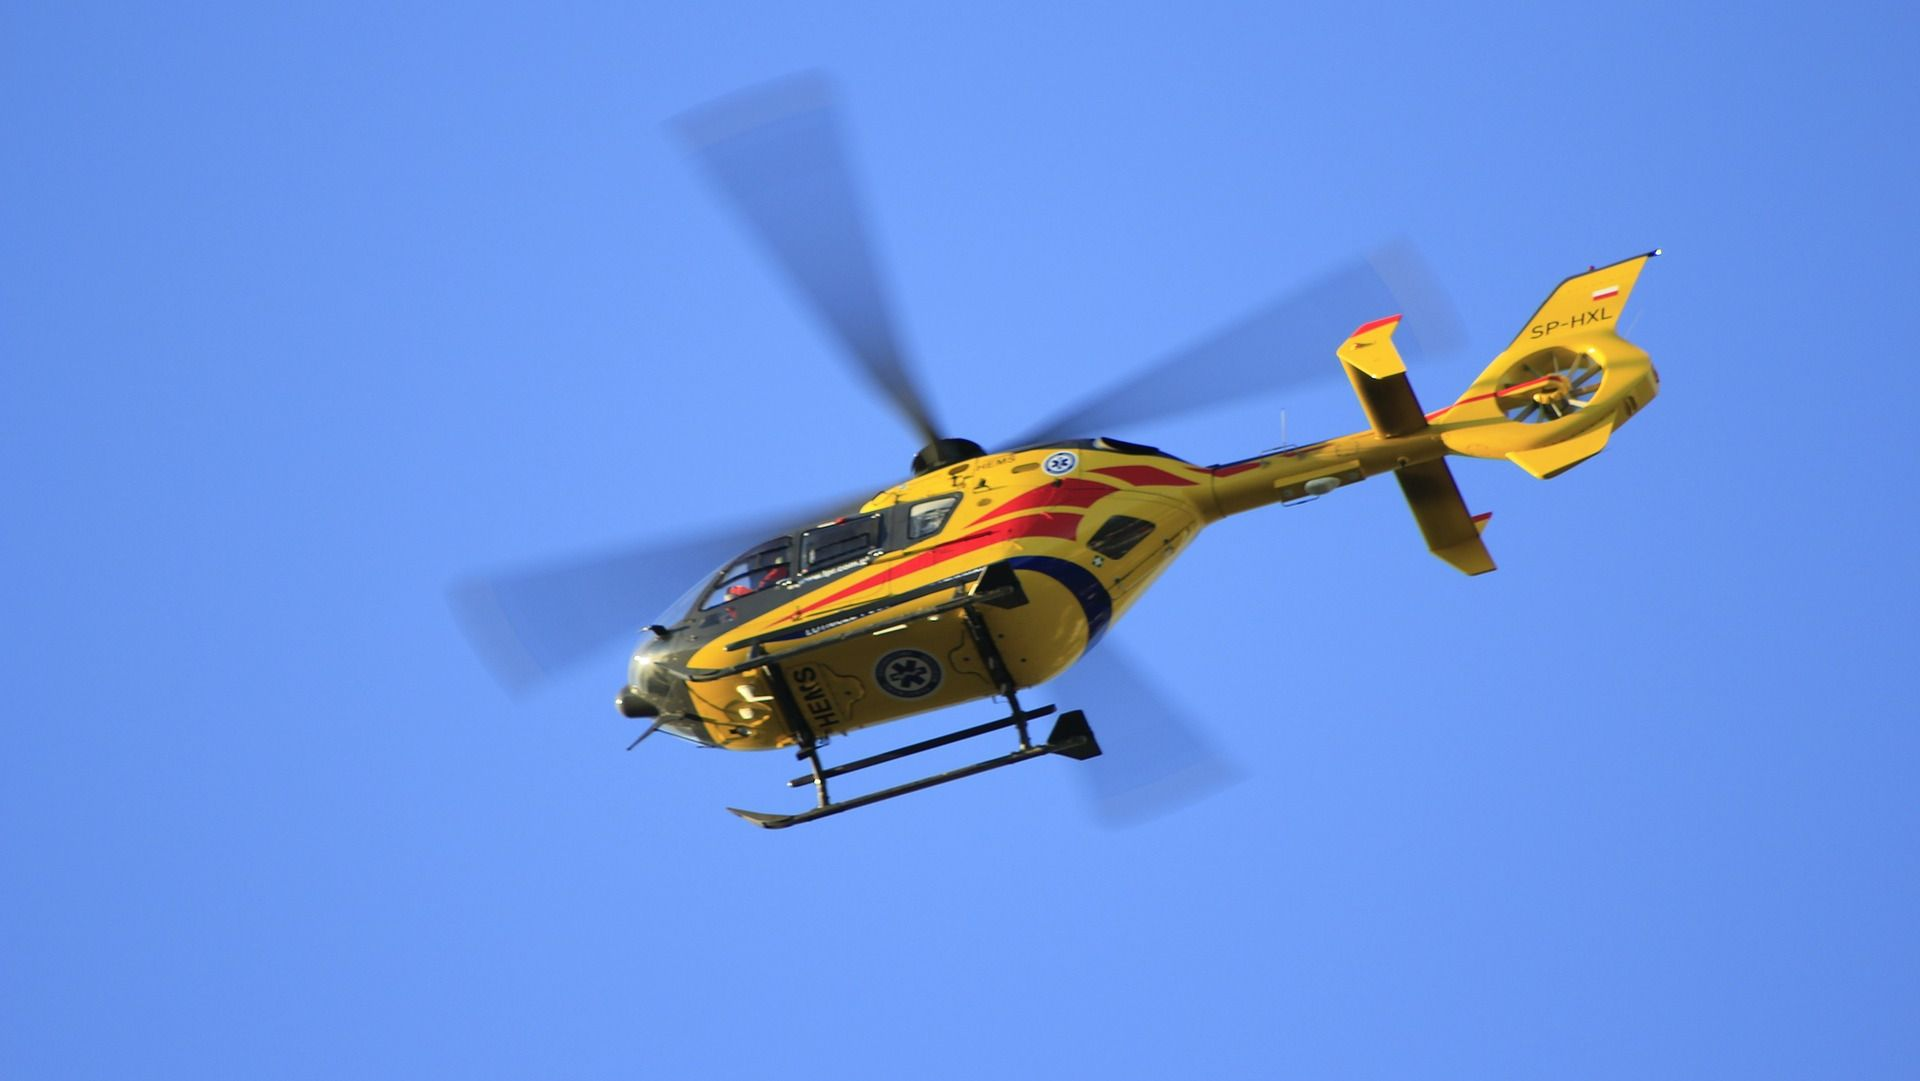 SLOVAČKA Srušio se spasilački helikopter, četiri osobe poginule